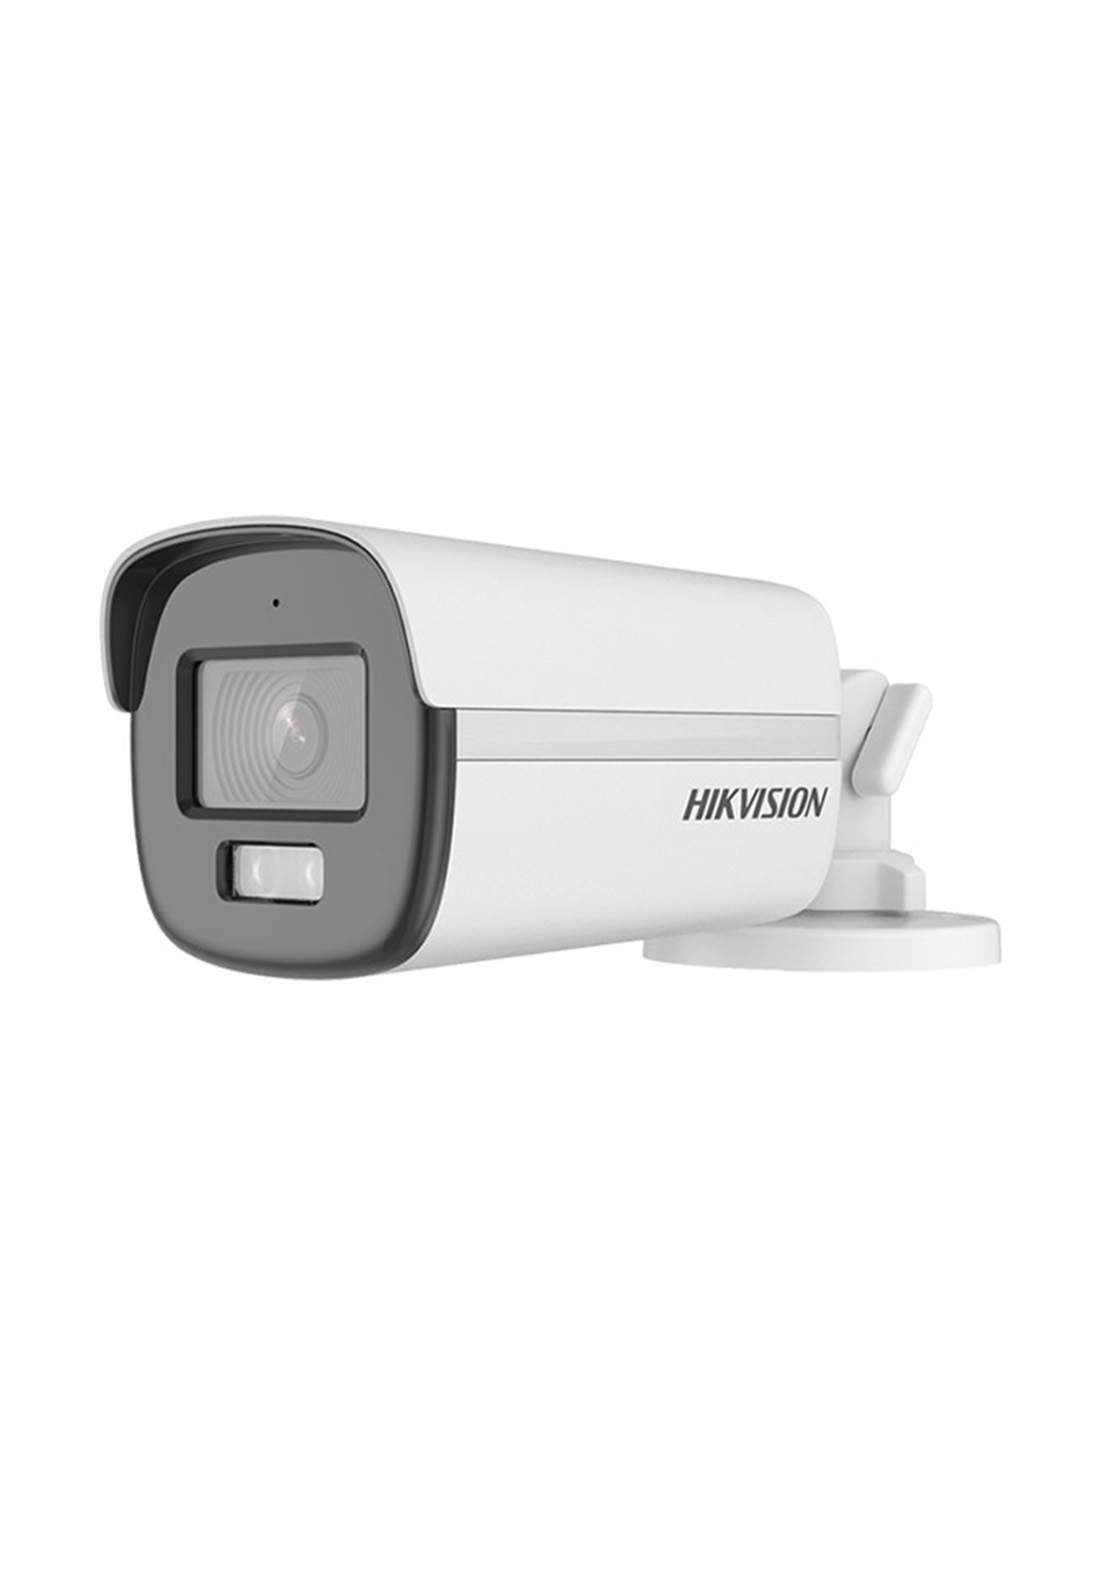 Hikvision DS-2CE10KF0T-FS ColorVu Audio Fixed Mini Bullet Camera 3.6 mm Lens - White  كاميرا مراقبة